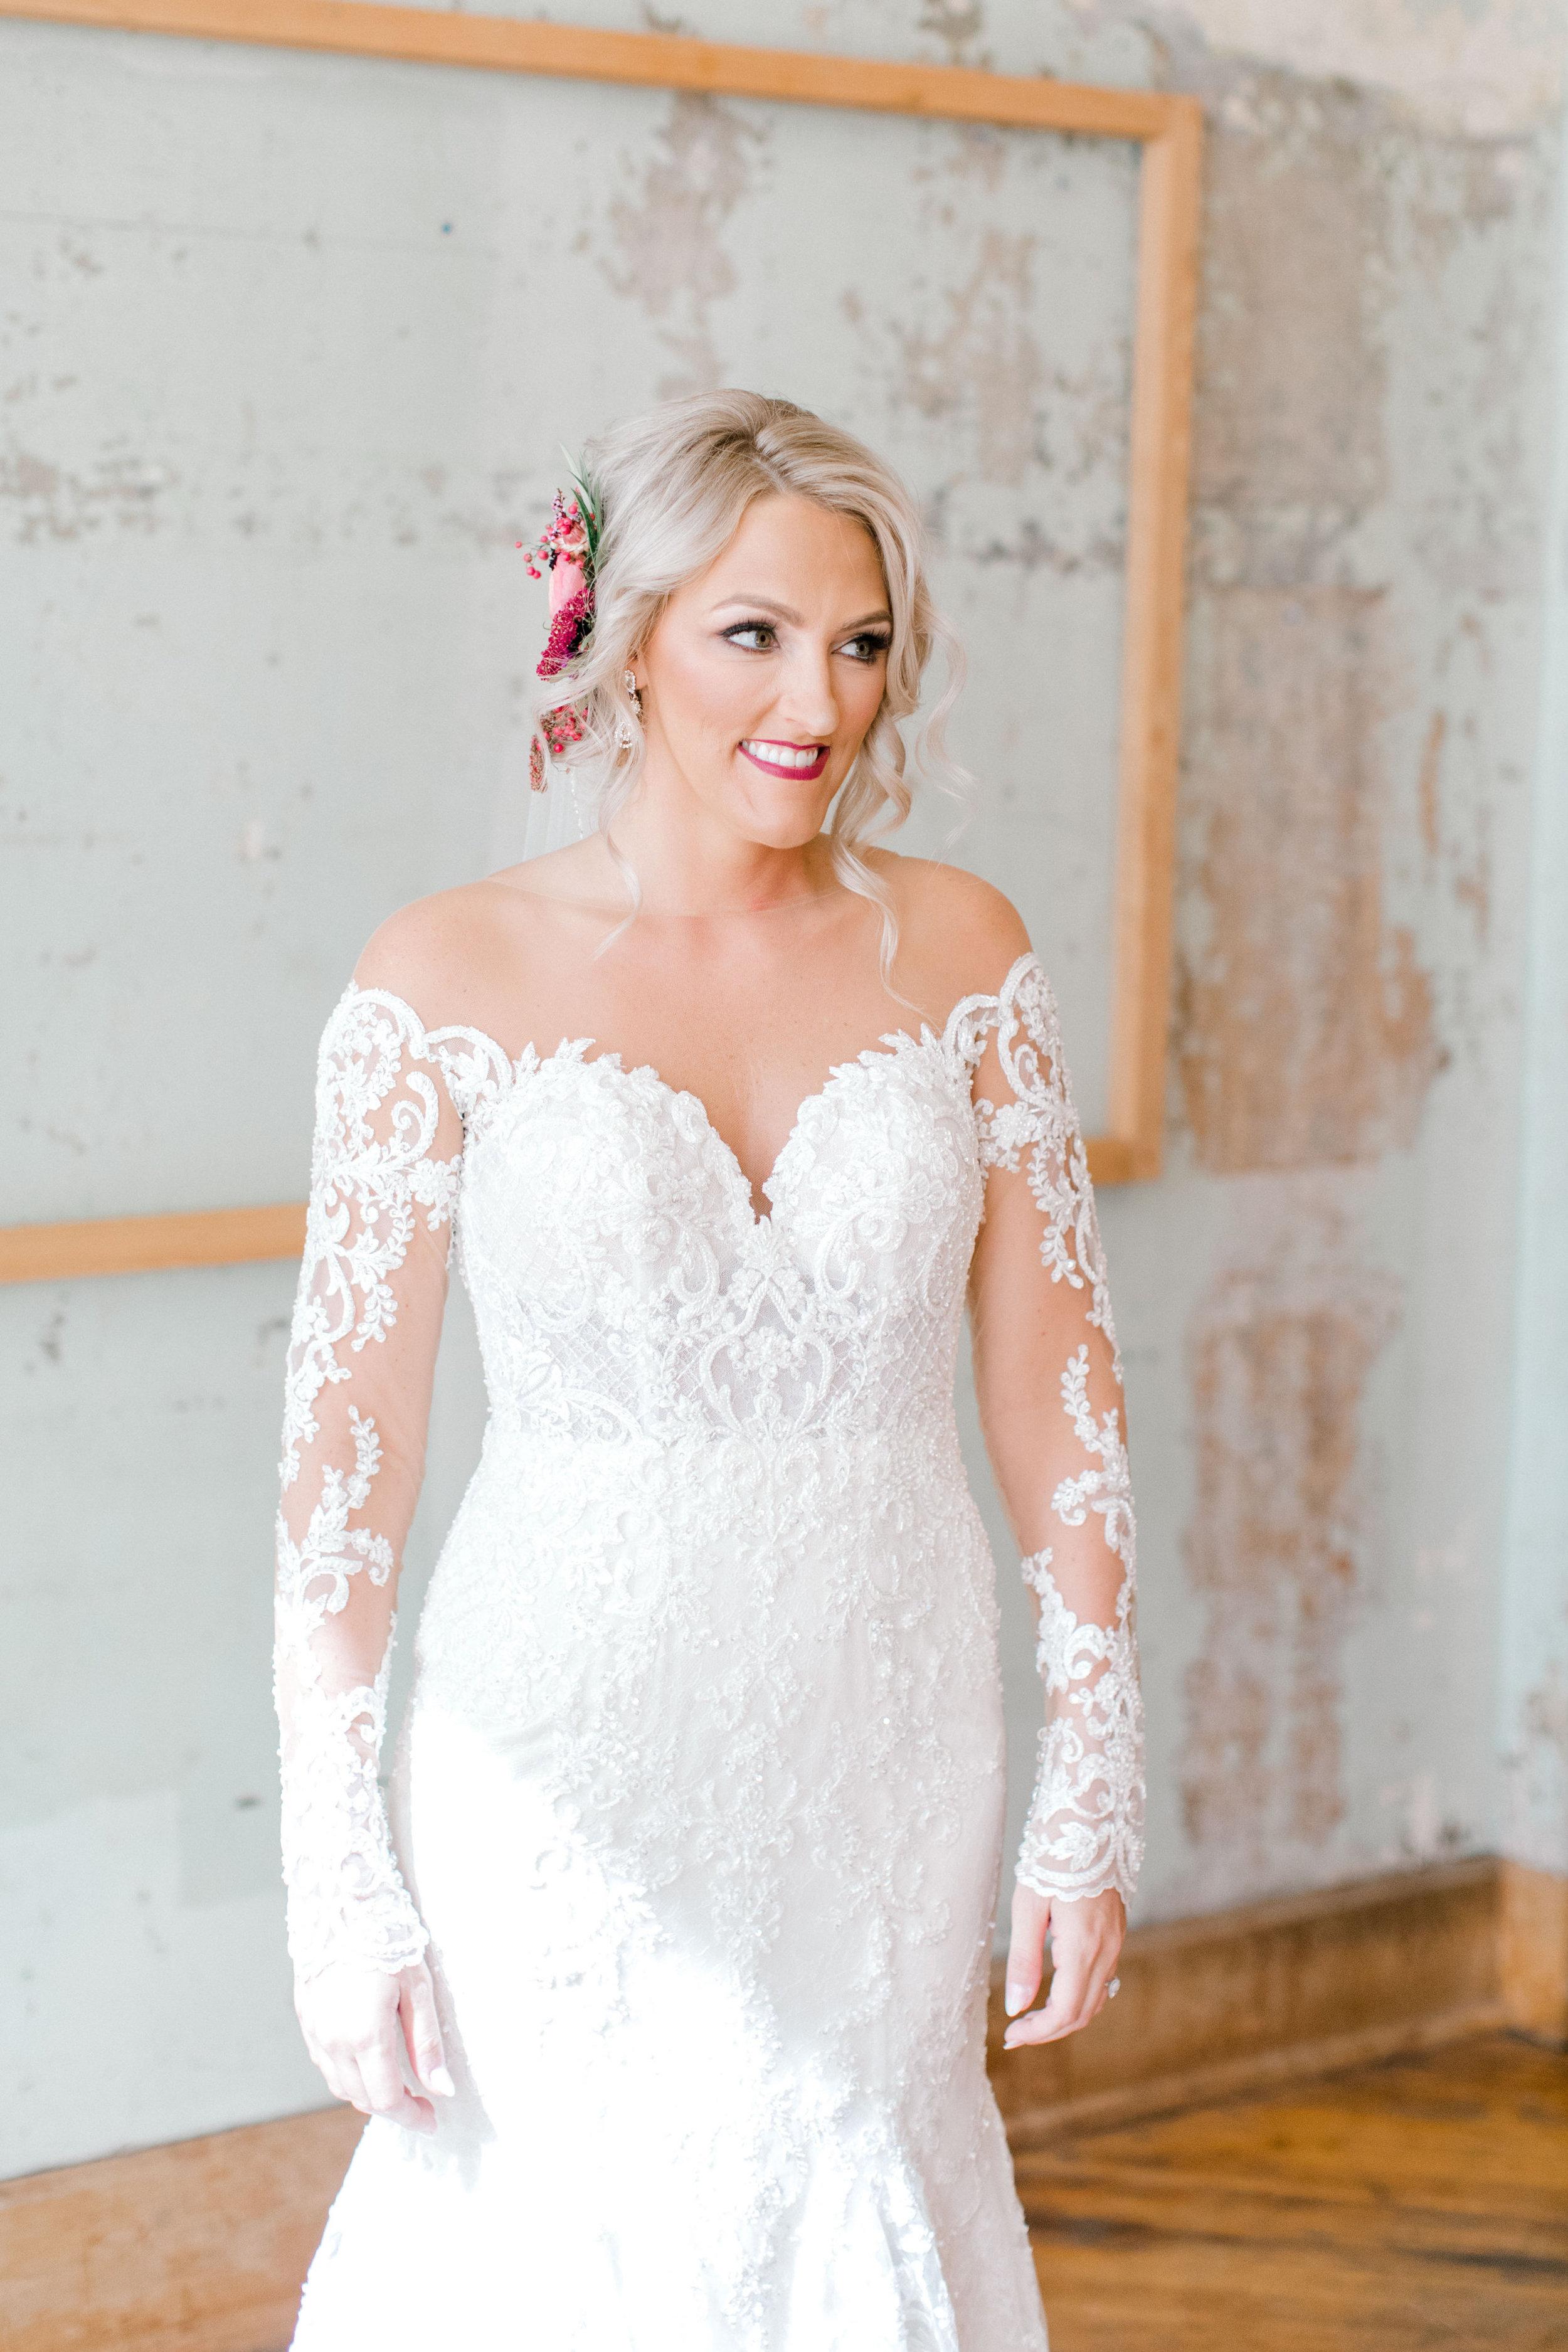 Ryan Alexa Married-Getting Ready First Look-0079.jpg